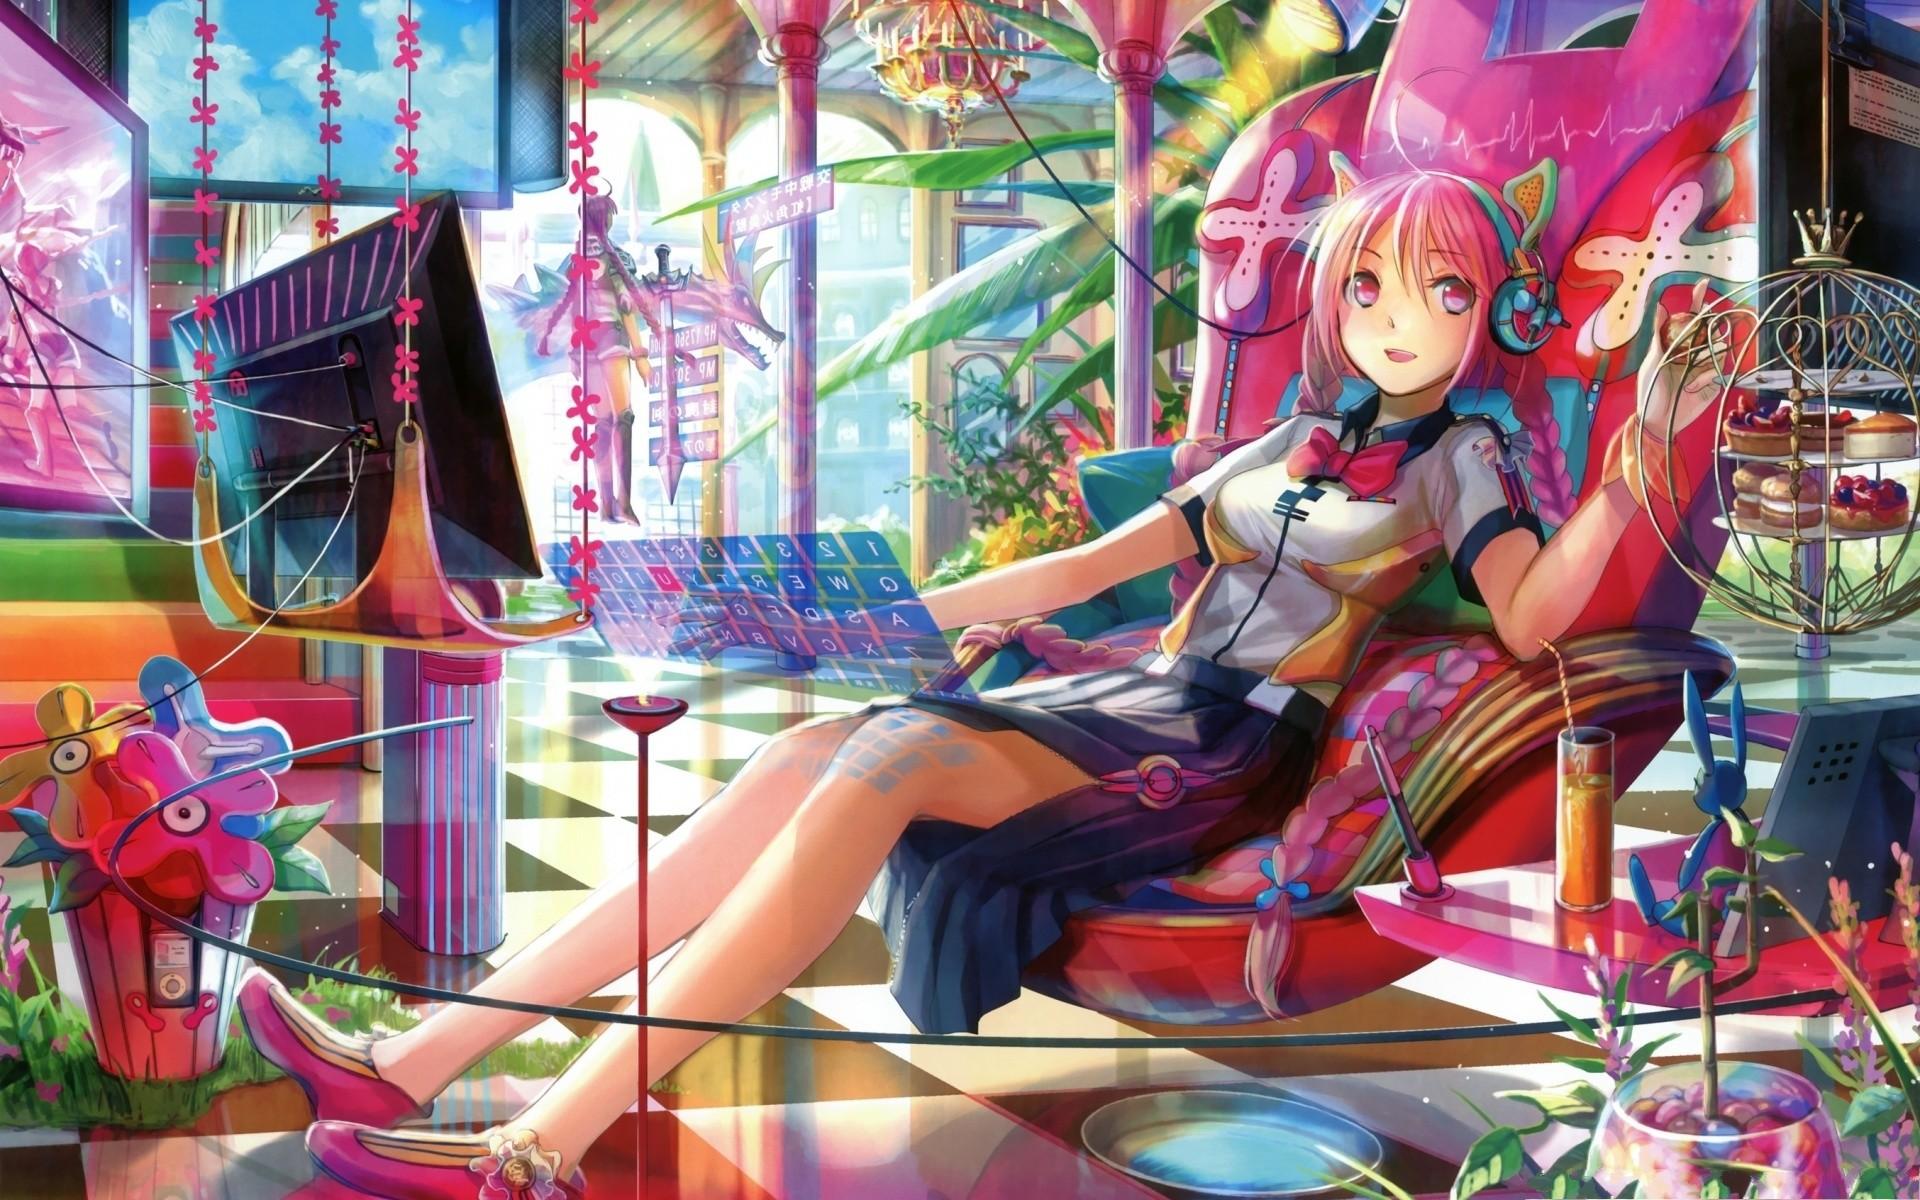 Res: 1920x1200, Techno Anime